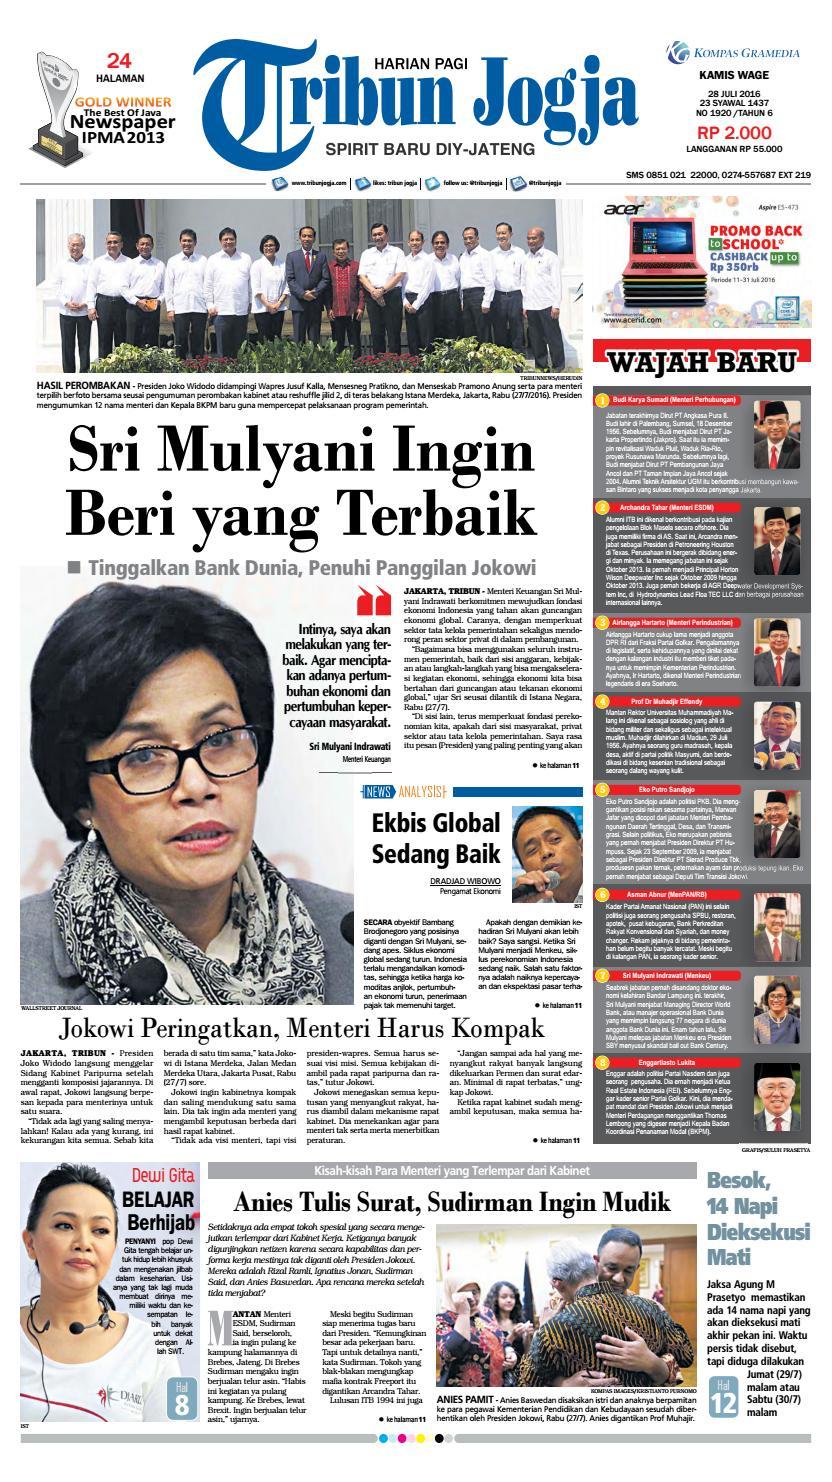 Tribunjogja 28 07 2016 By Tribun Jogja Issuu Produk Ukm Bumn Gaun Putih Maya Raisa Kebaya